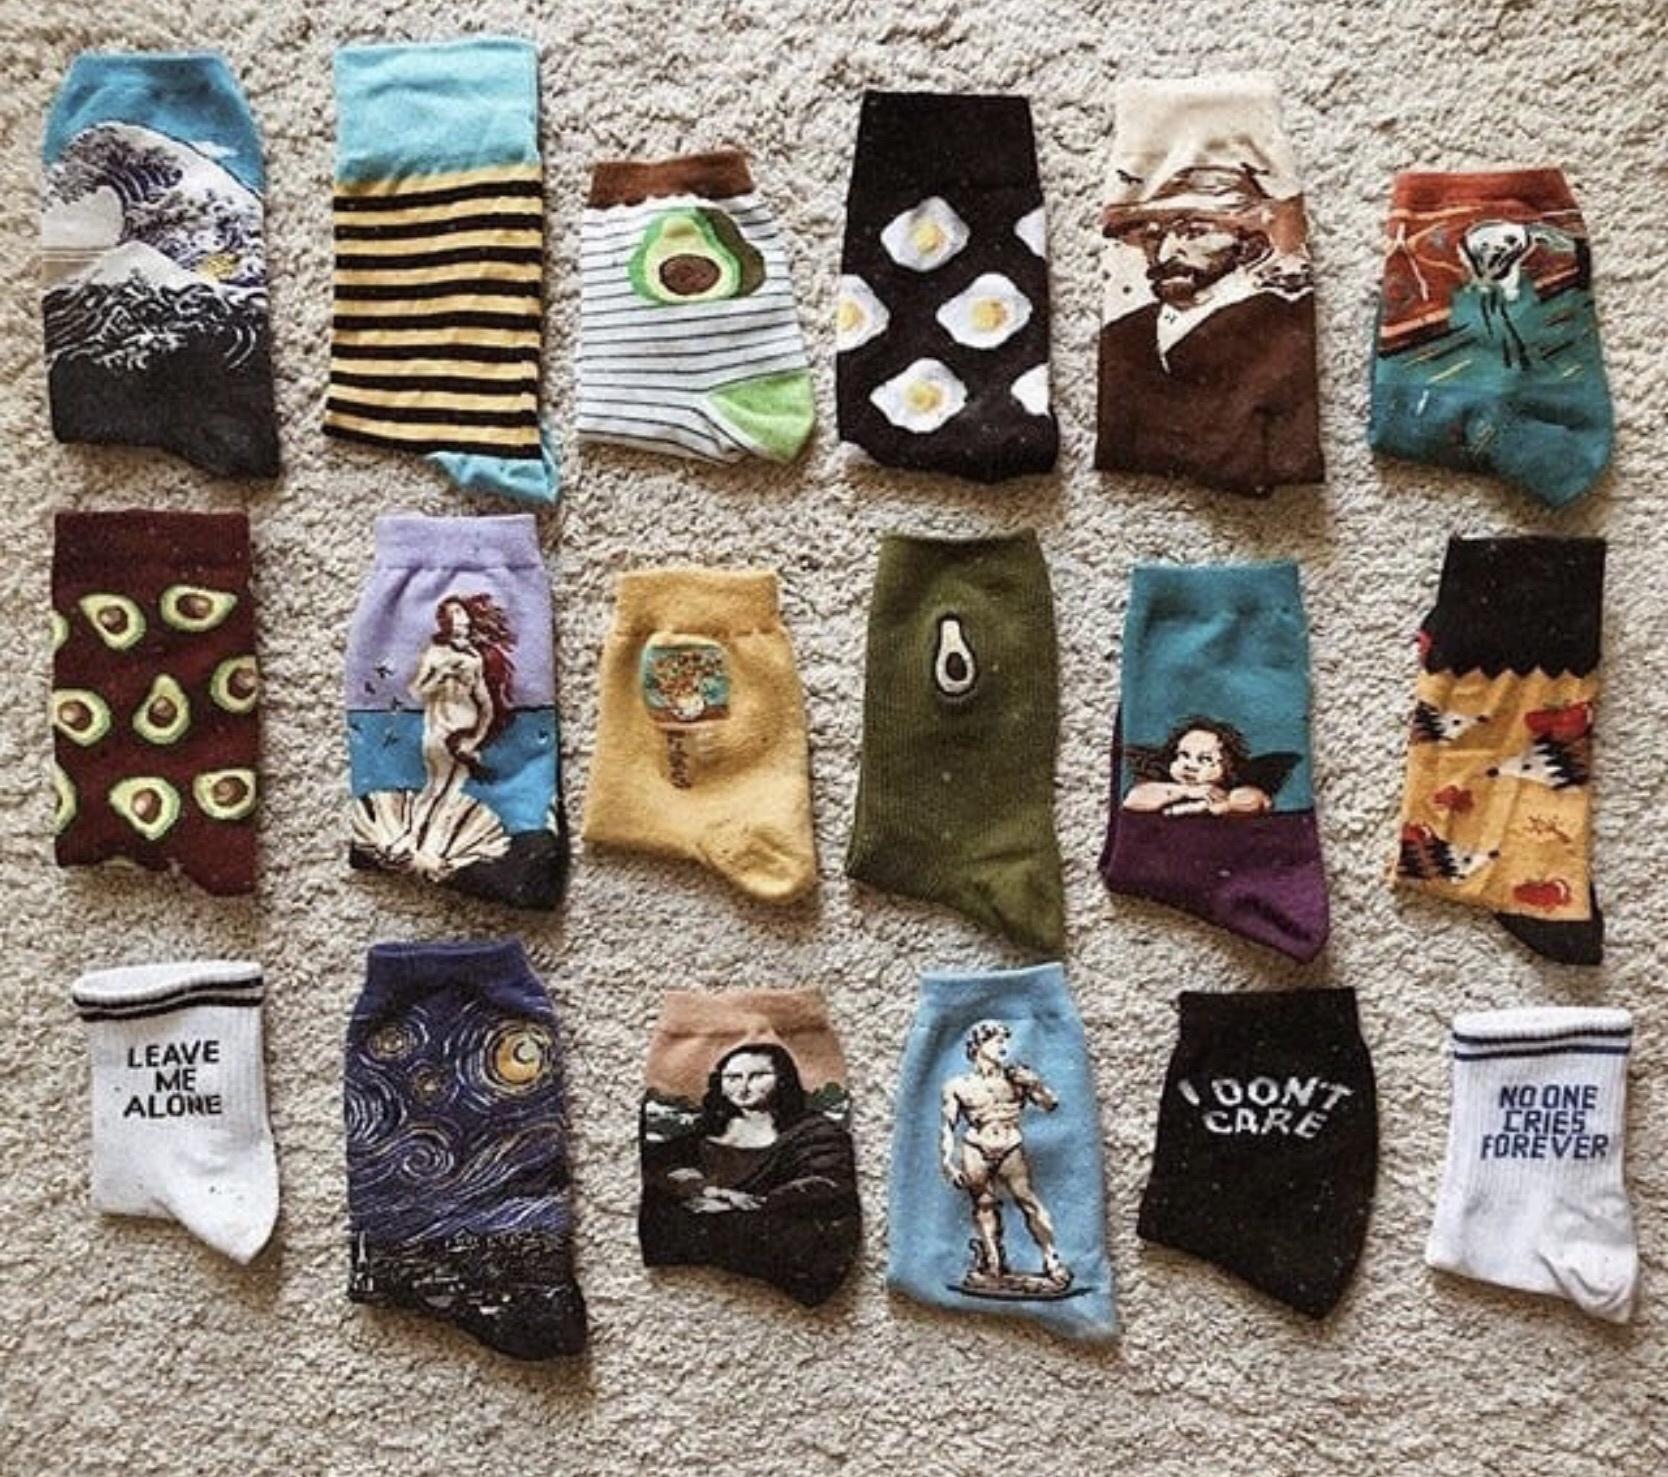 socks tumblr grunge art vincent van gogh painting vintage